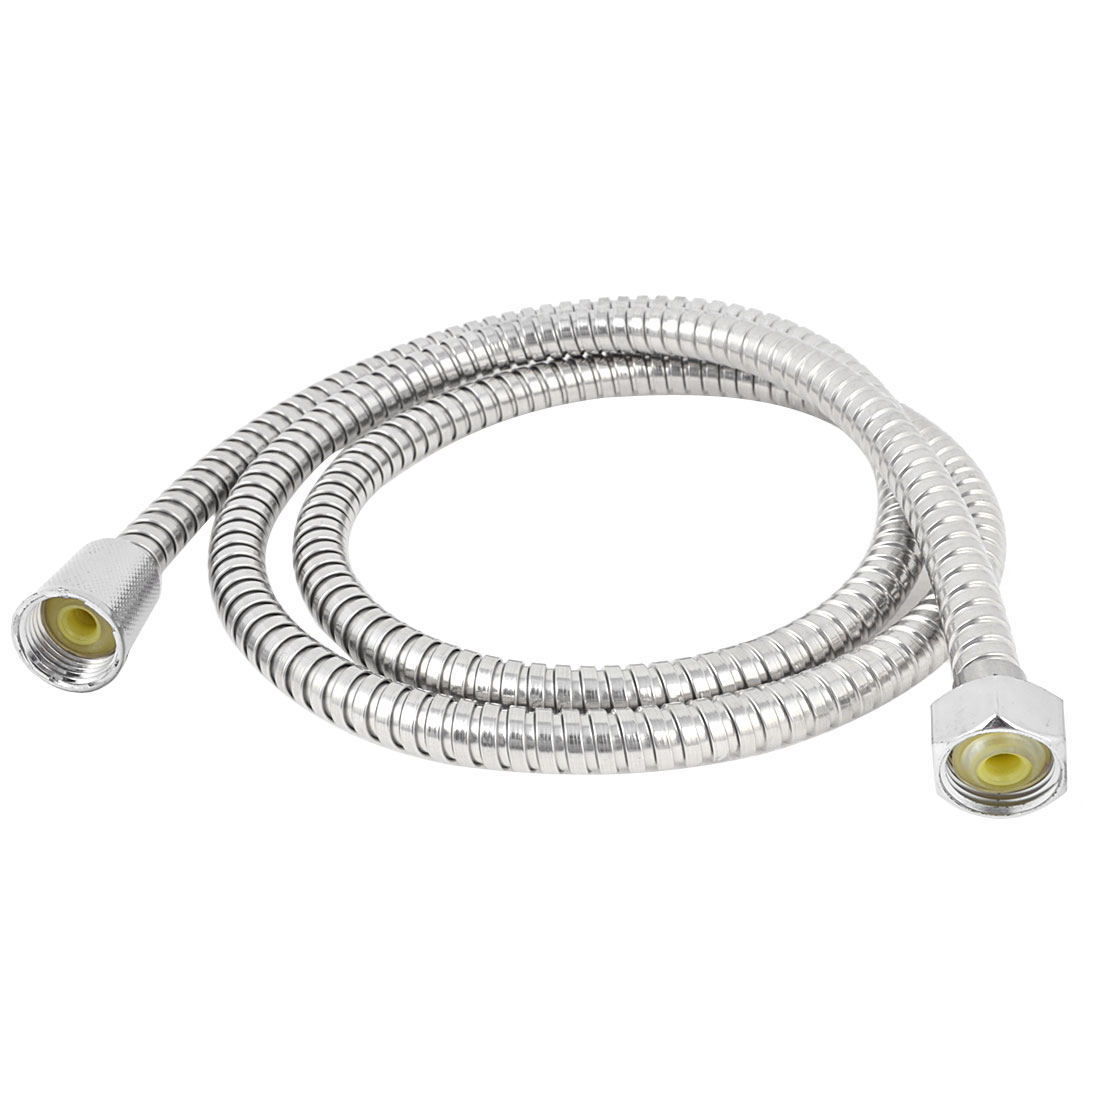 Bathroom 1/2BSP Thread Flexible Spiral Shower Hose Pipe 4.76Ft Long